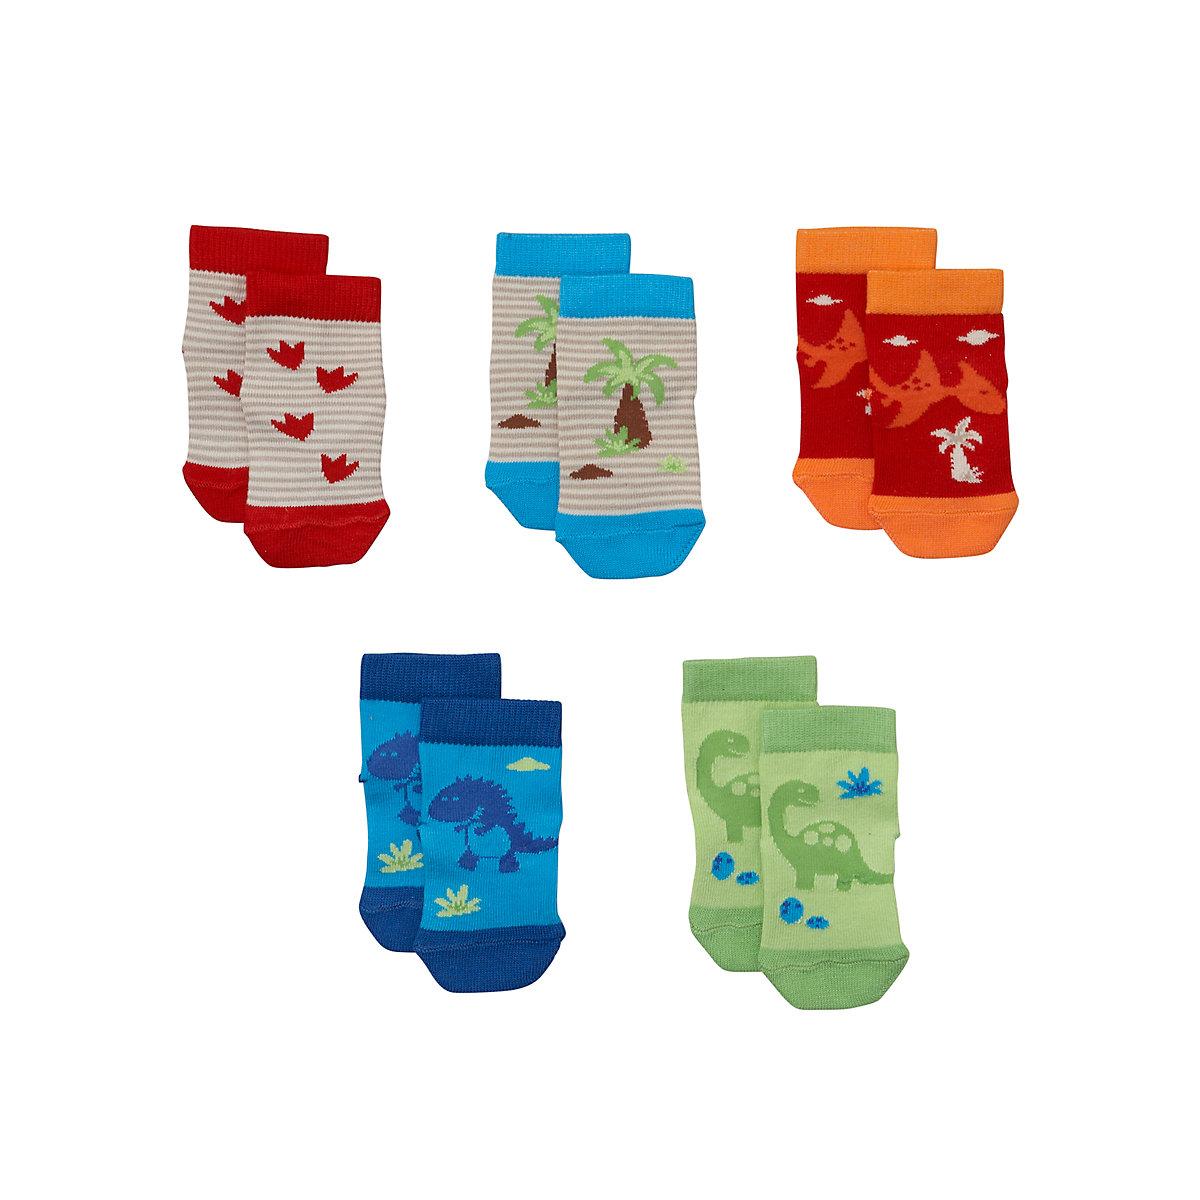 Mothercare Dinosaur Socks - 5 Pack - Dinosaur Gifts